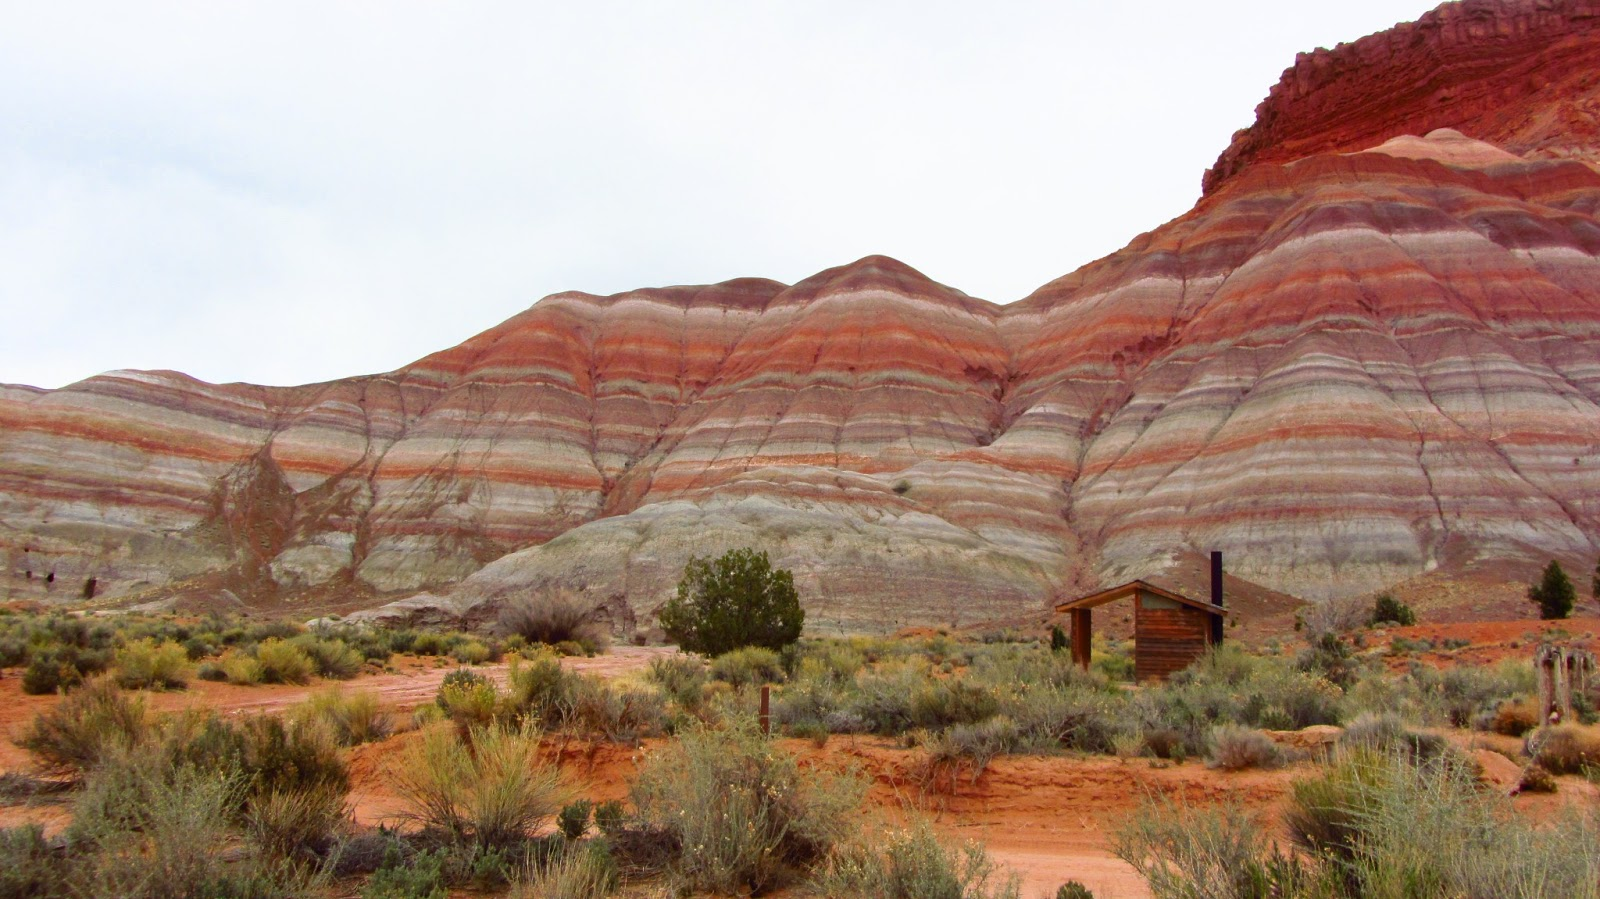 My photography vermillion cliffs kanab utah for California chiude l utah